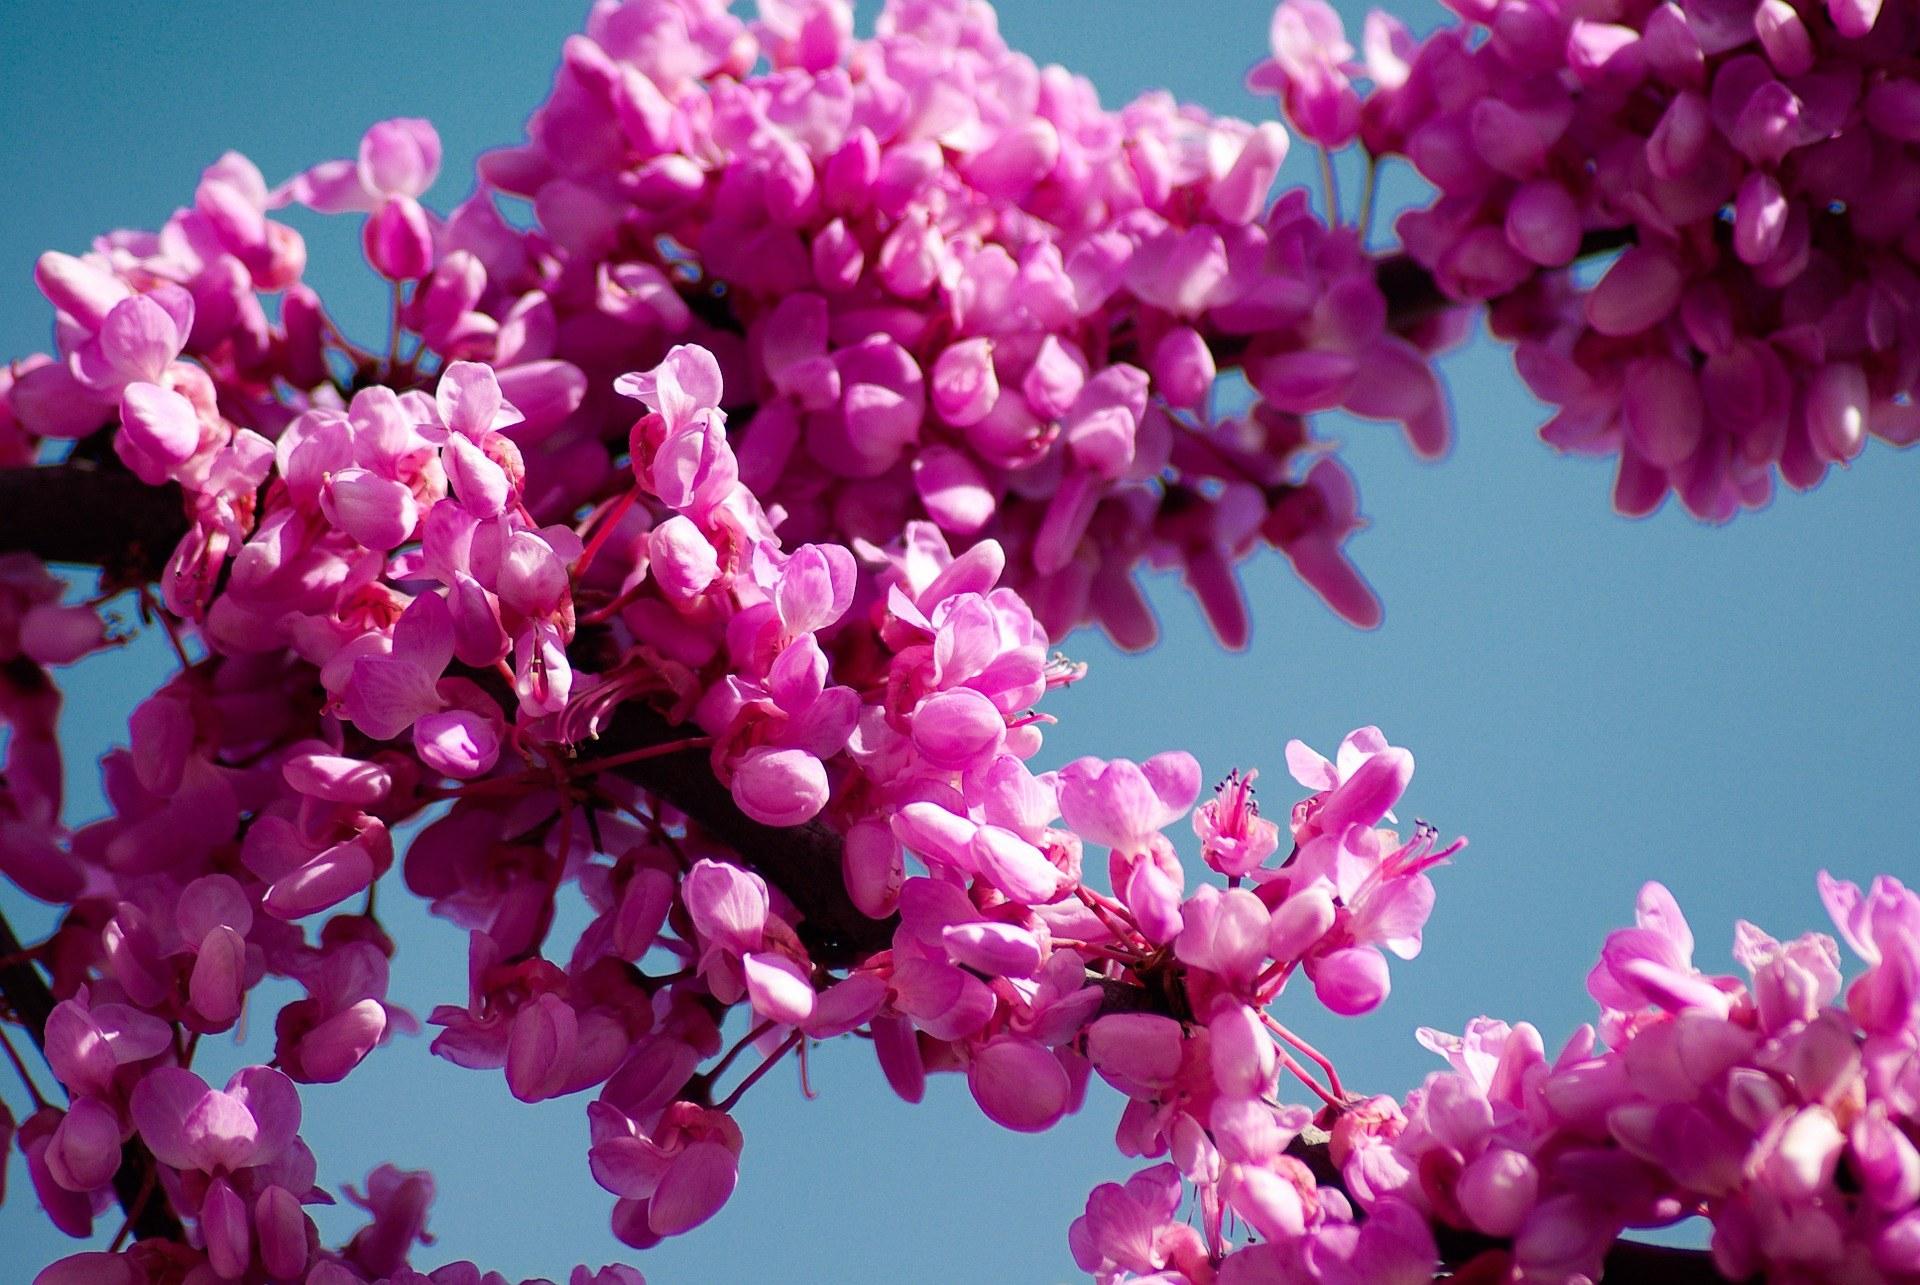 Cercis siliquastrum - Arbre judée - Floraison - Albera Pep